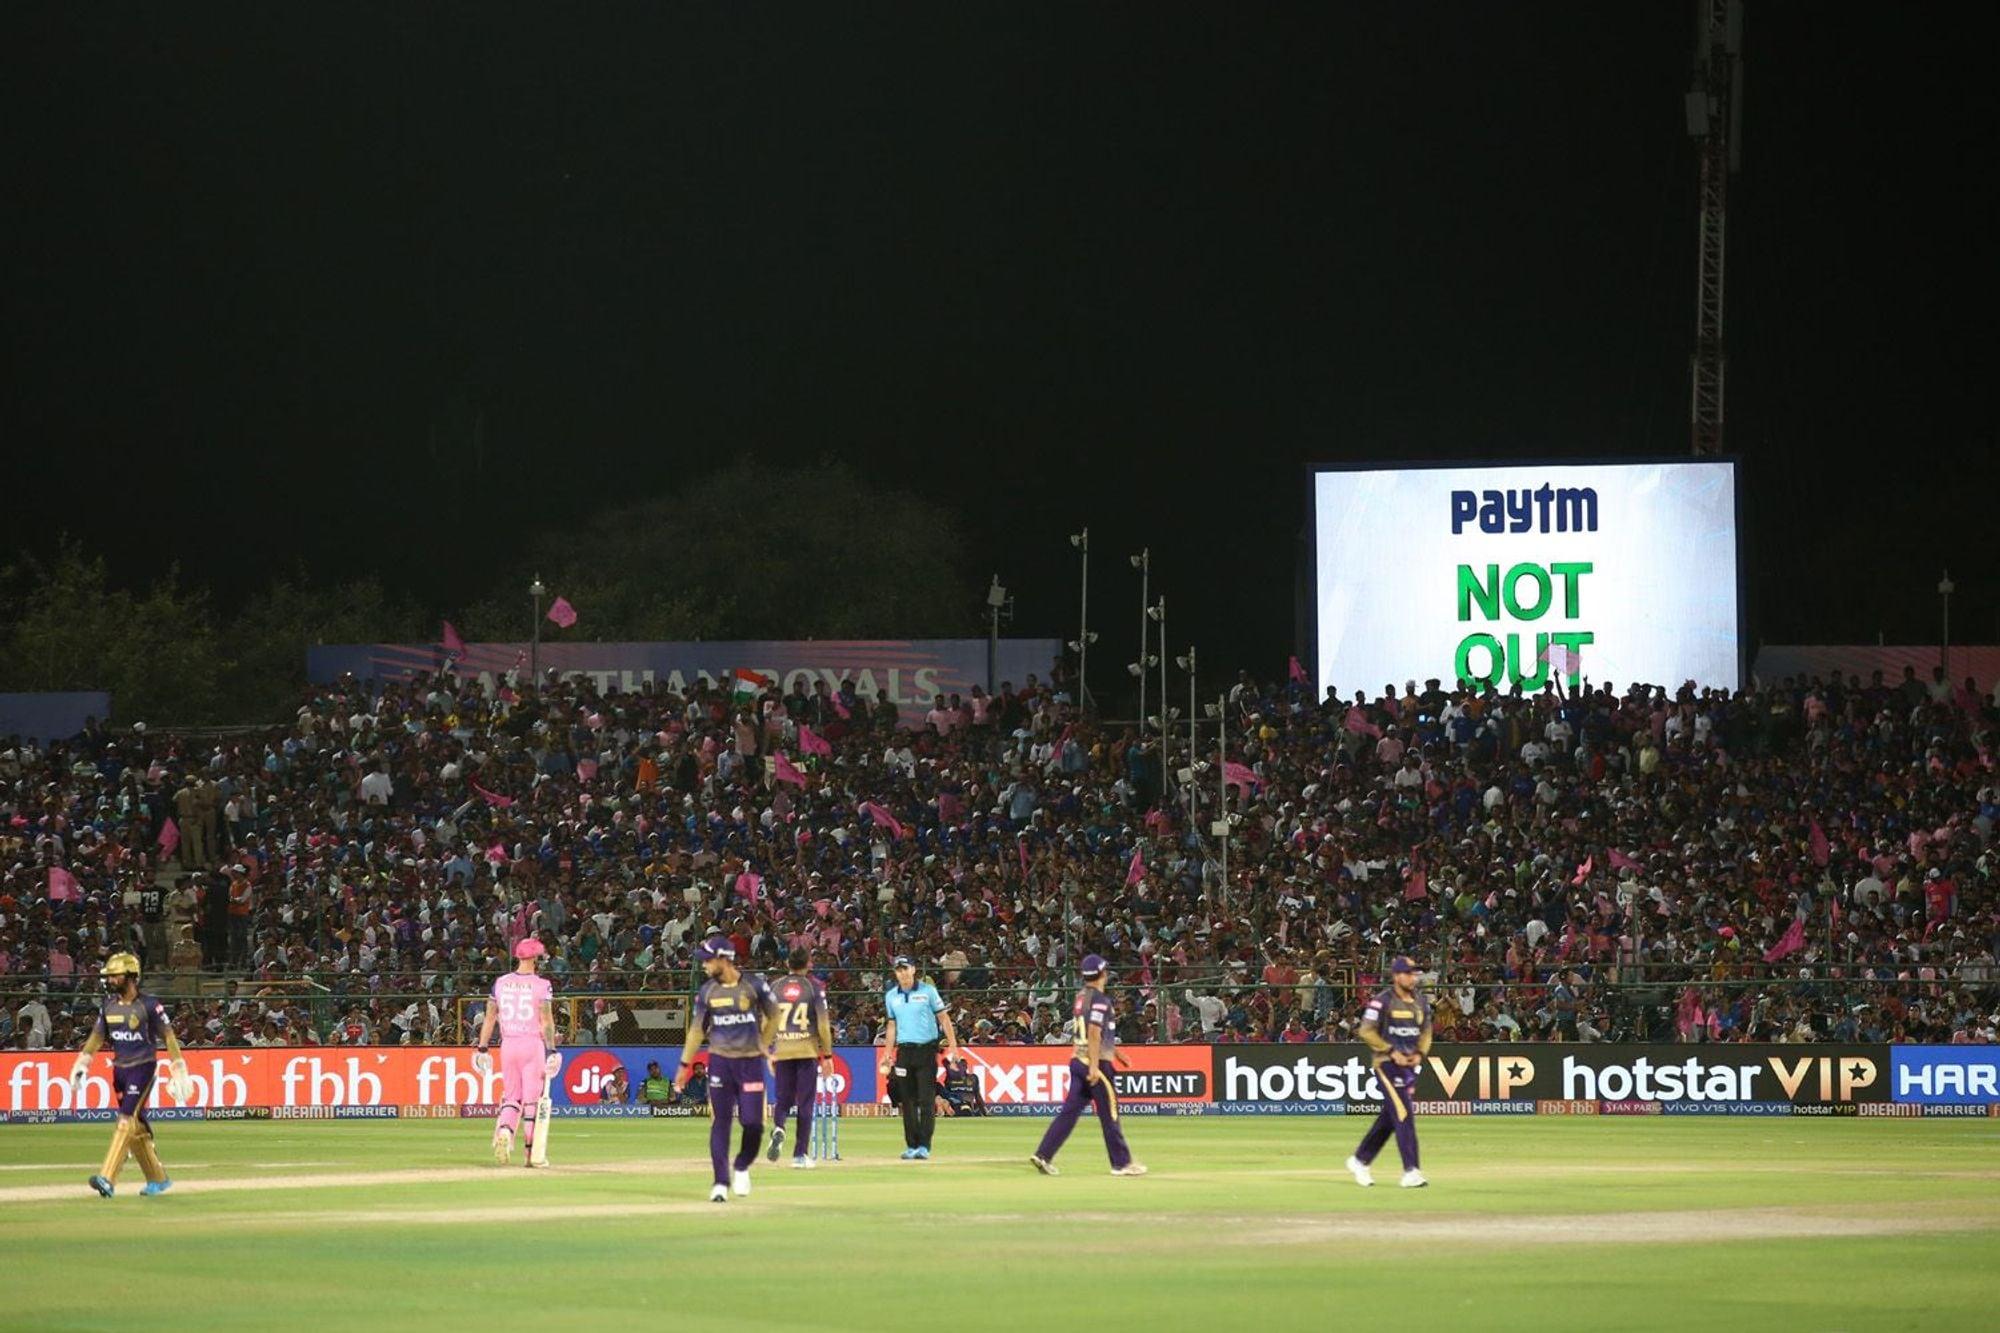 In Pics, Match 21, Rajasthan Royals vs Kolkata Knight Riders